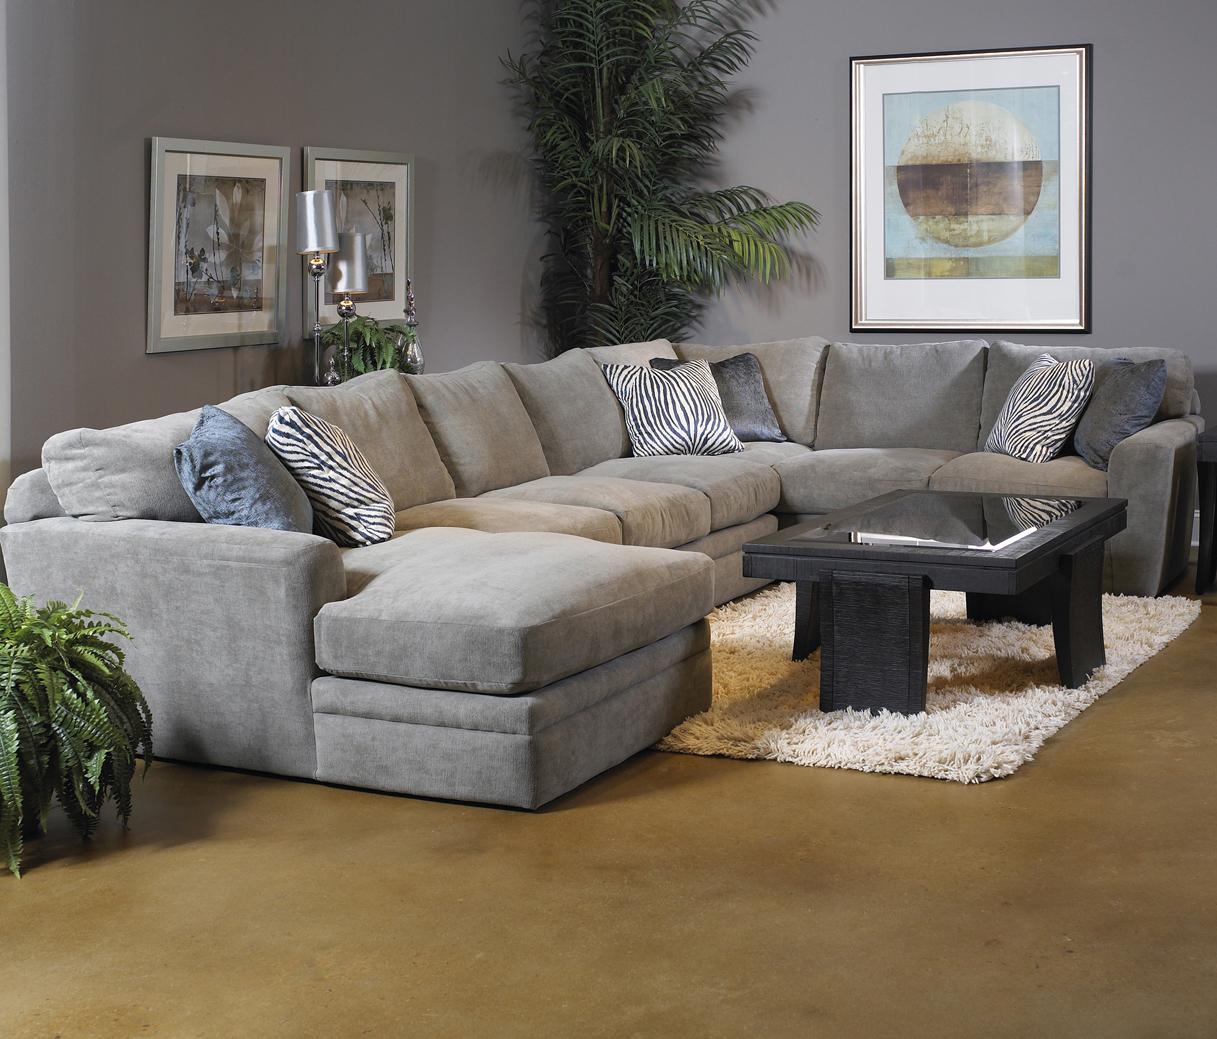 fairmont sofa what colour cushions for black leather designs palms 3 piece sectional dream home